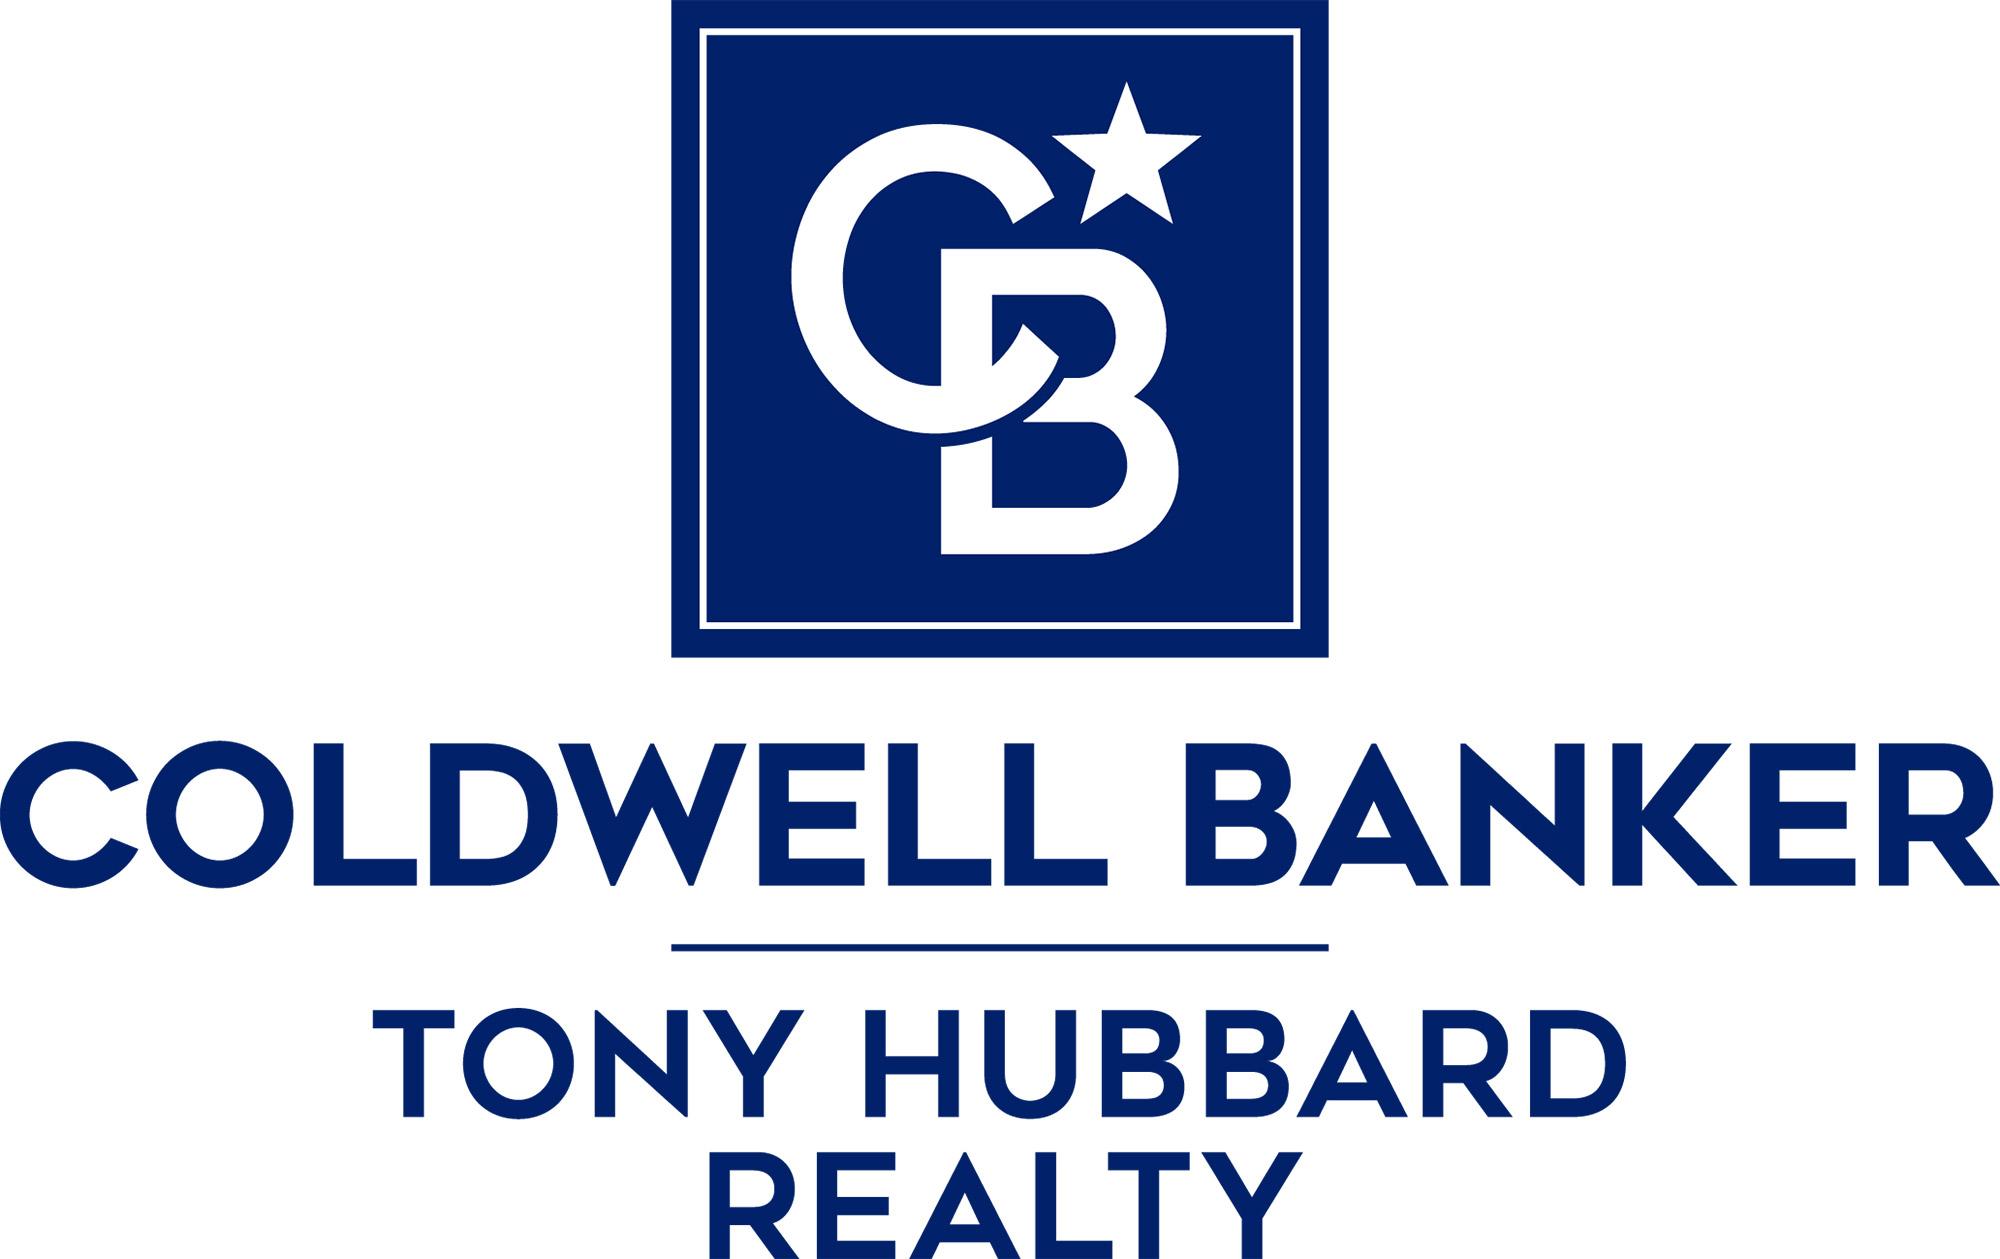 Anne Jones - Coldwell Banker Tony Hubbard Logo